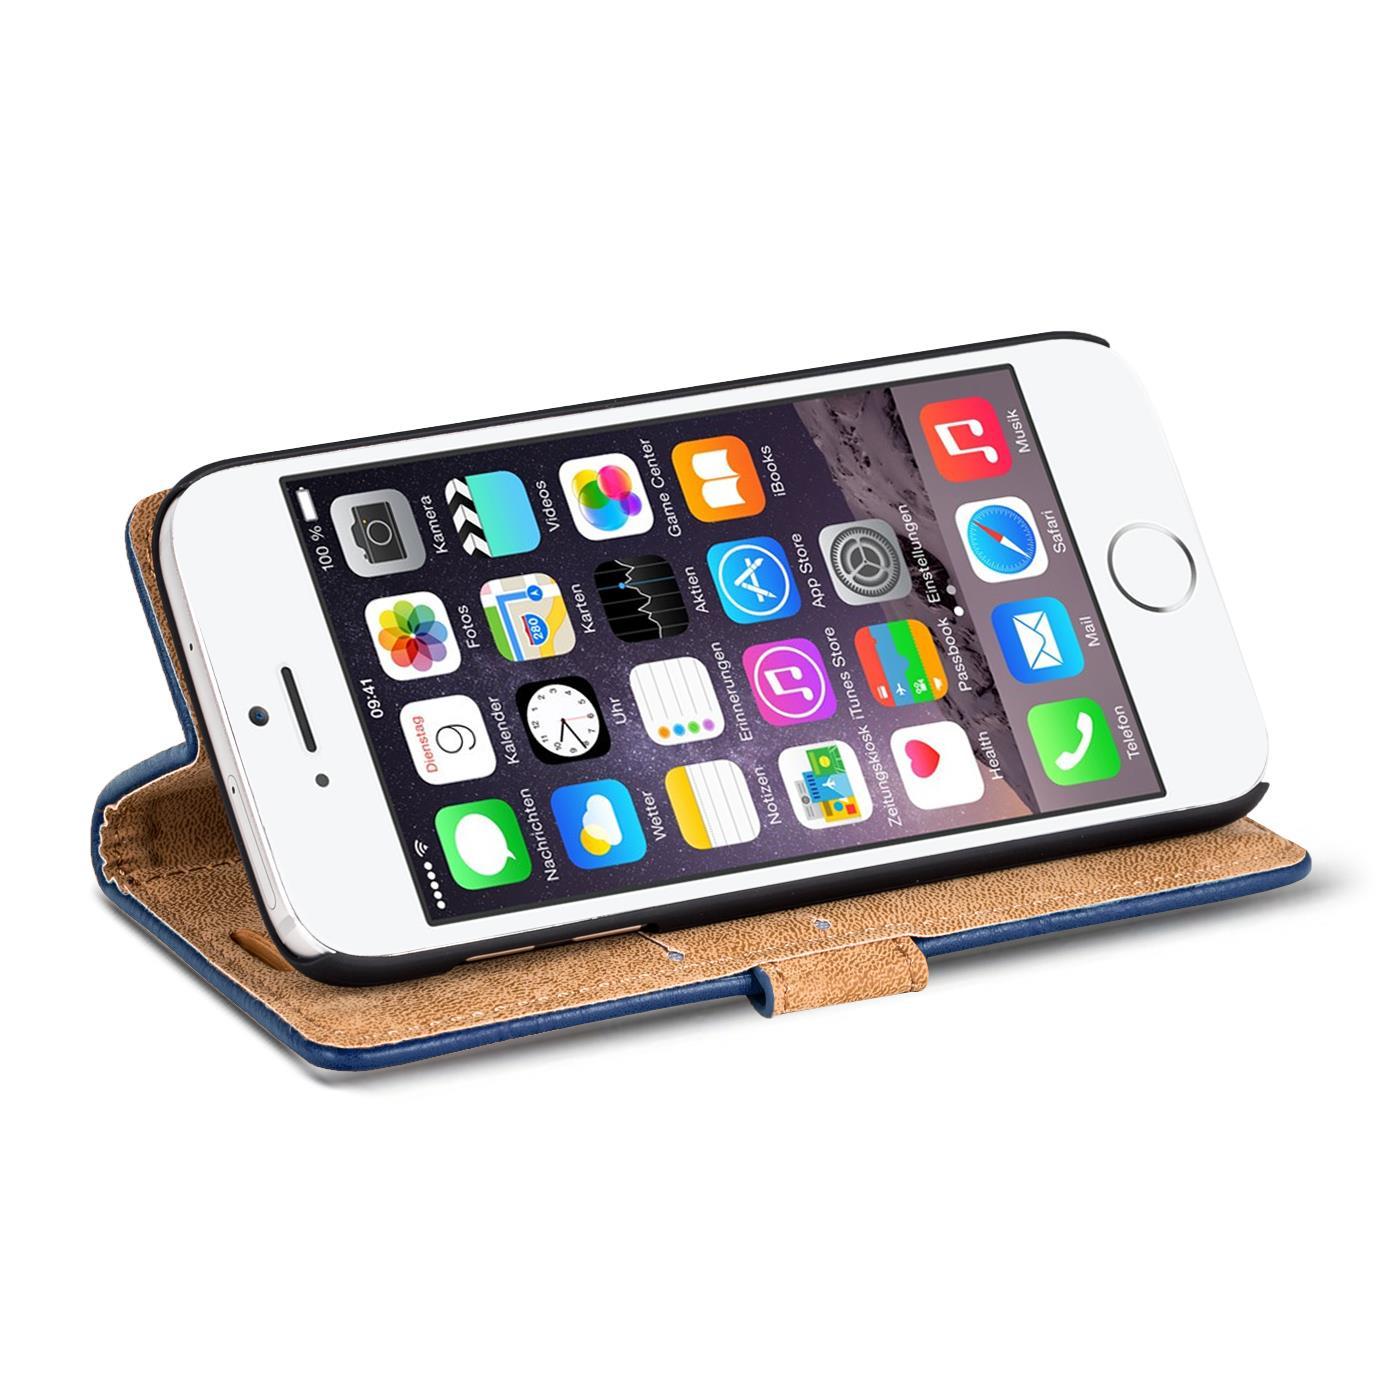 handy tasche h lle apple iphone 6 6s plus case klapph lle. Black Bedroom Furniture Sets. Home Design Ideas